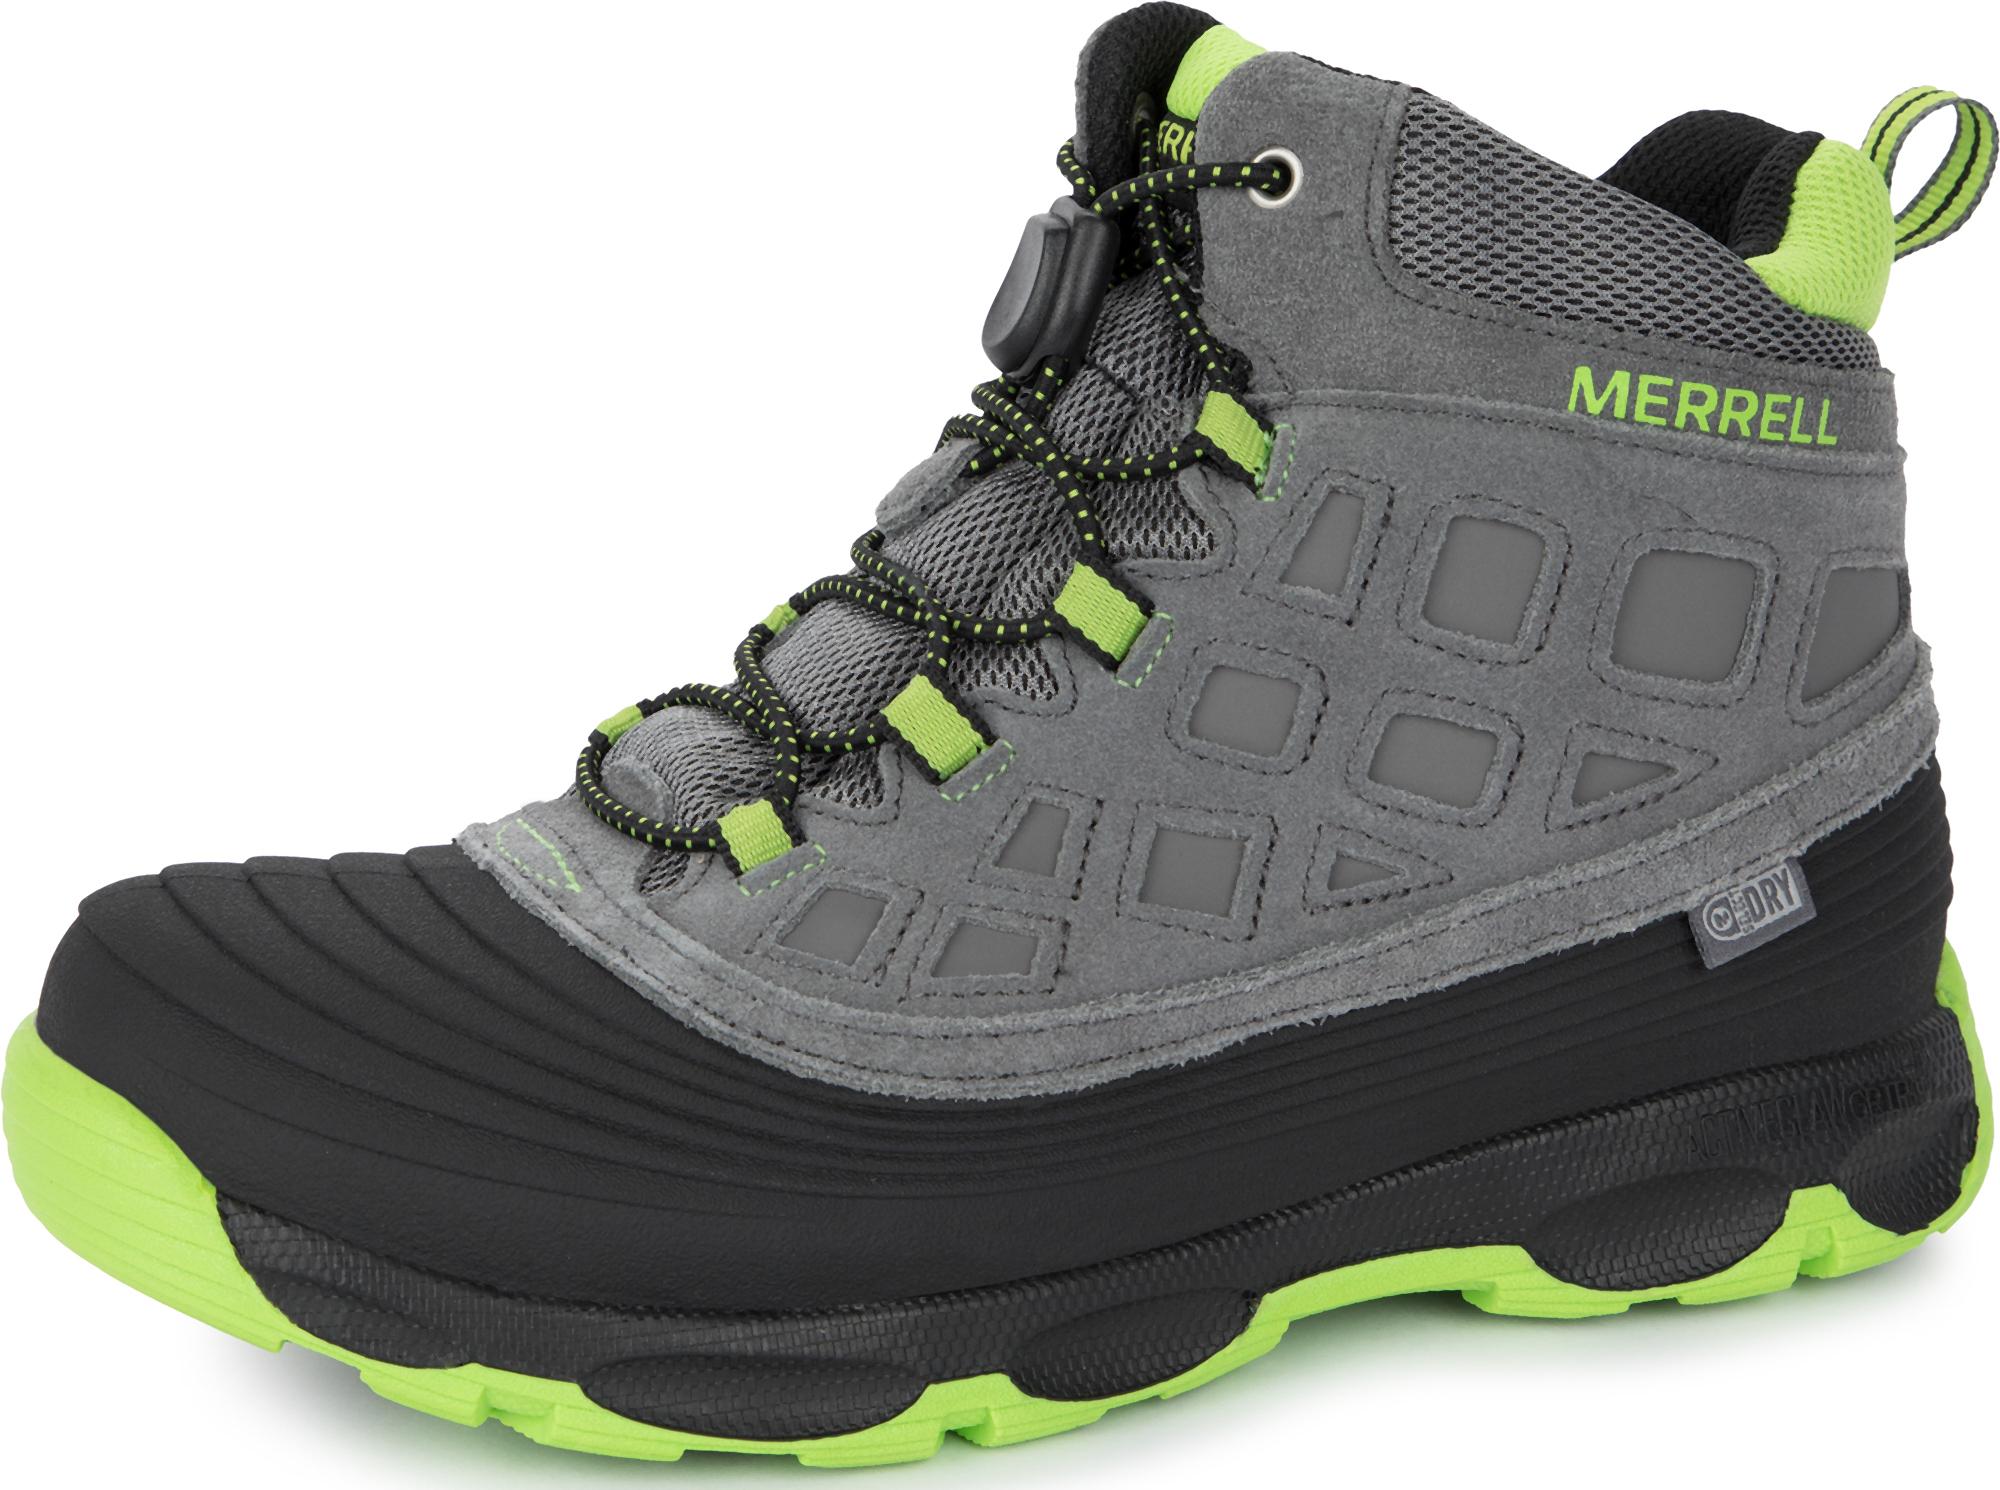 Merrell Ботинки утепленные для мальчиков Merrell M-Thrmoshvr2.0, размер 40,5 цены онлайн